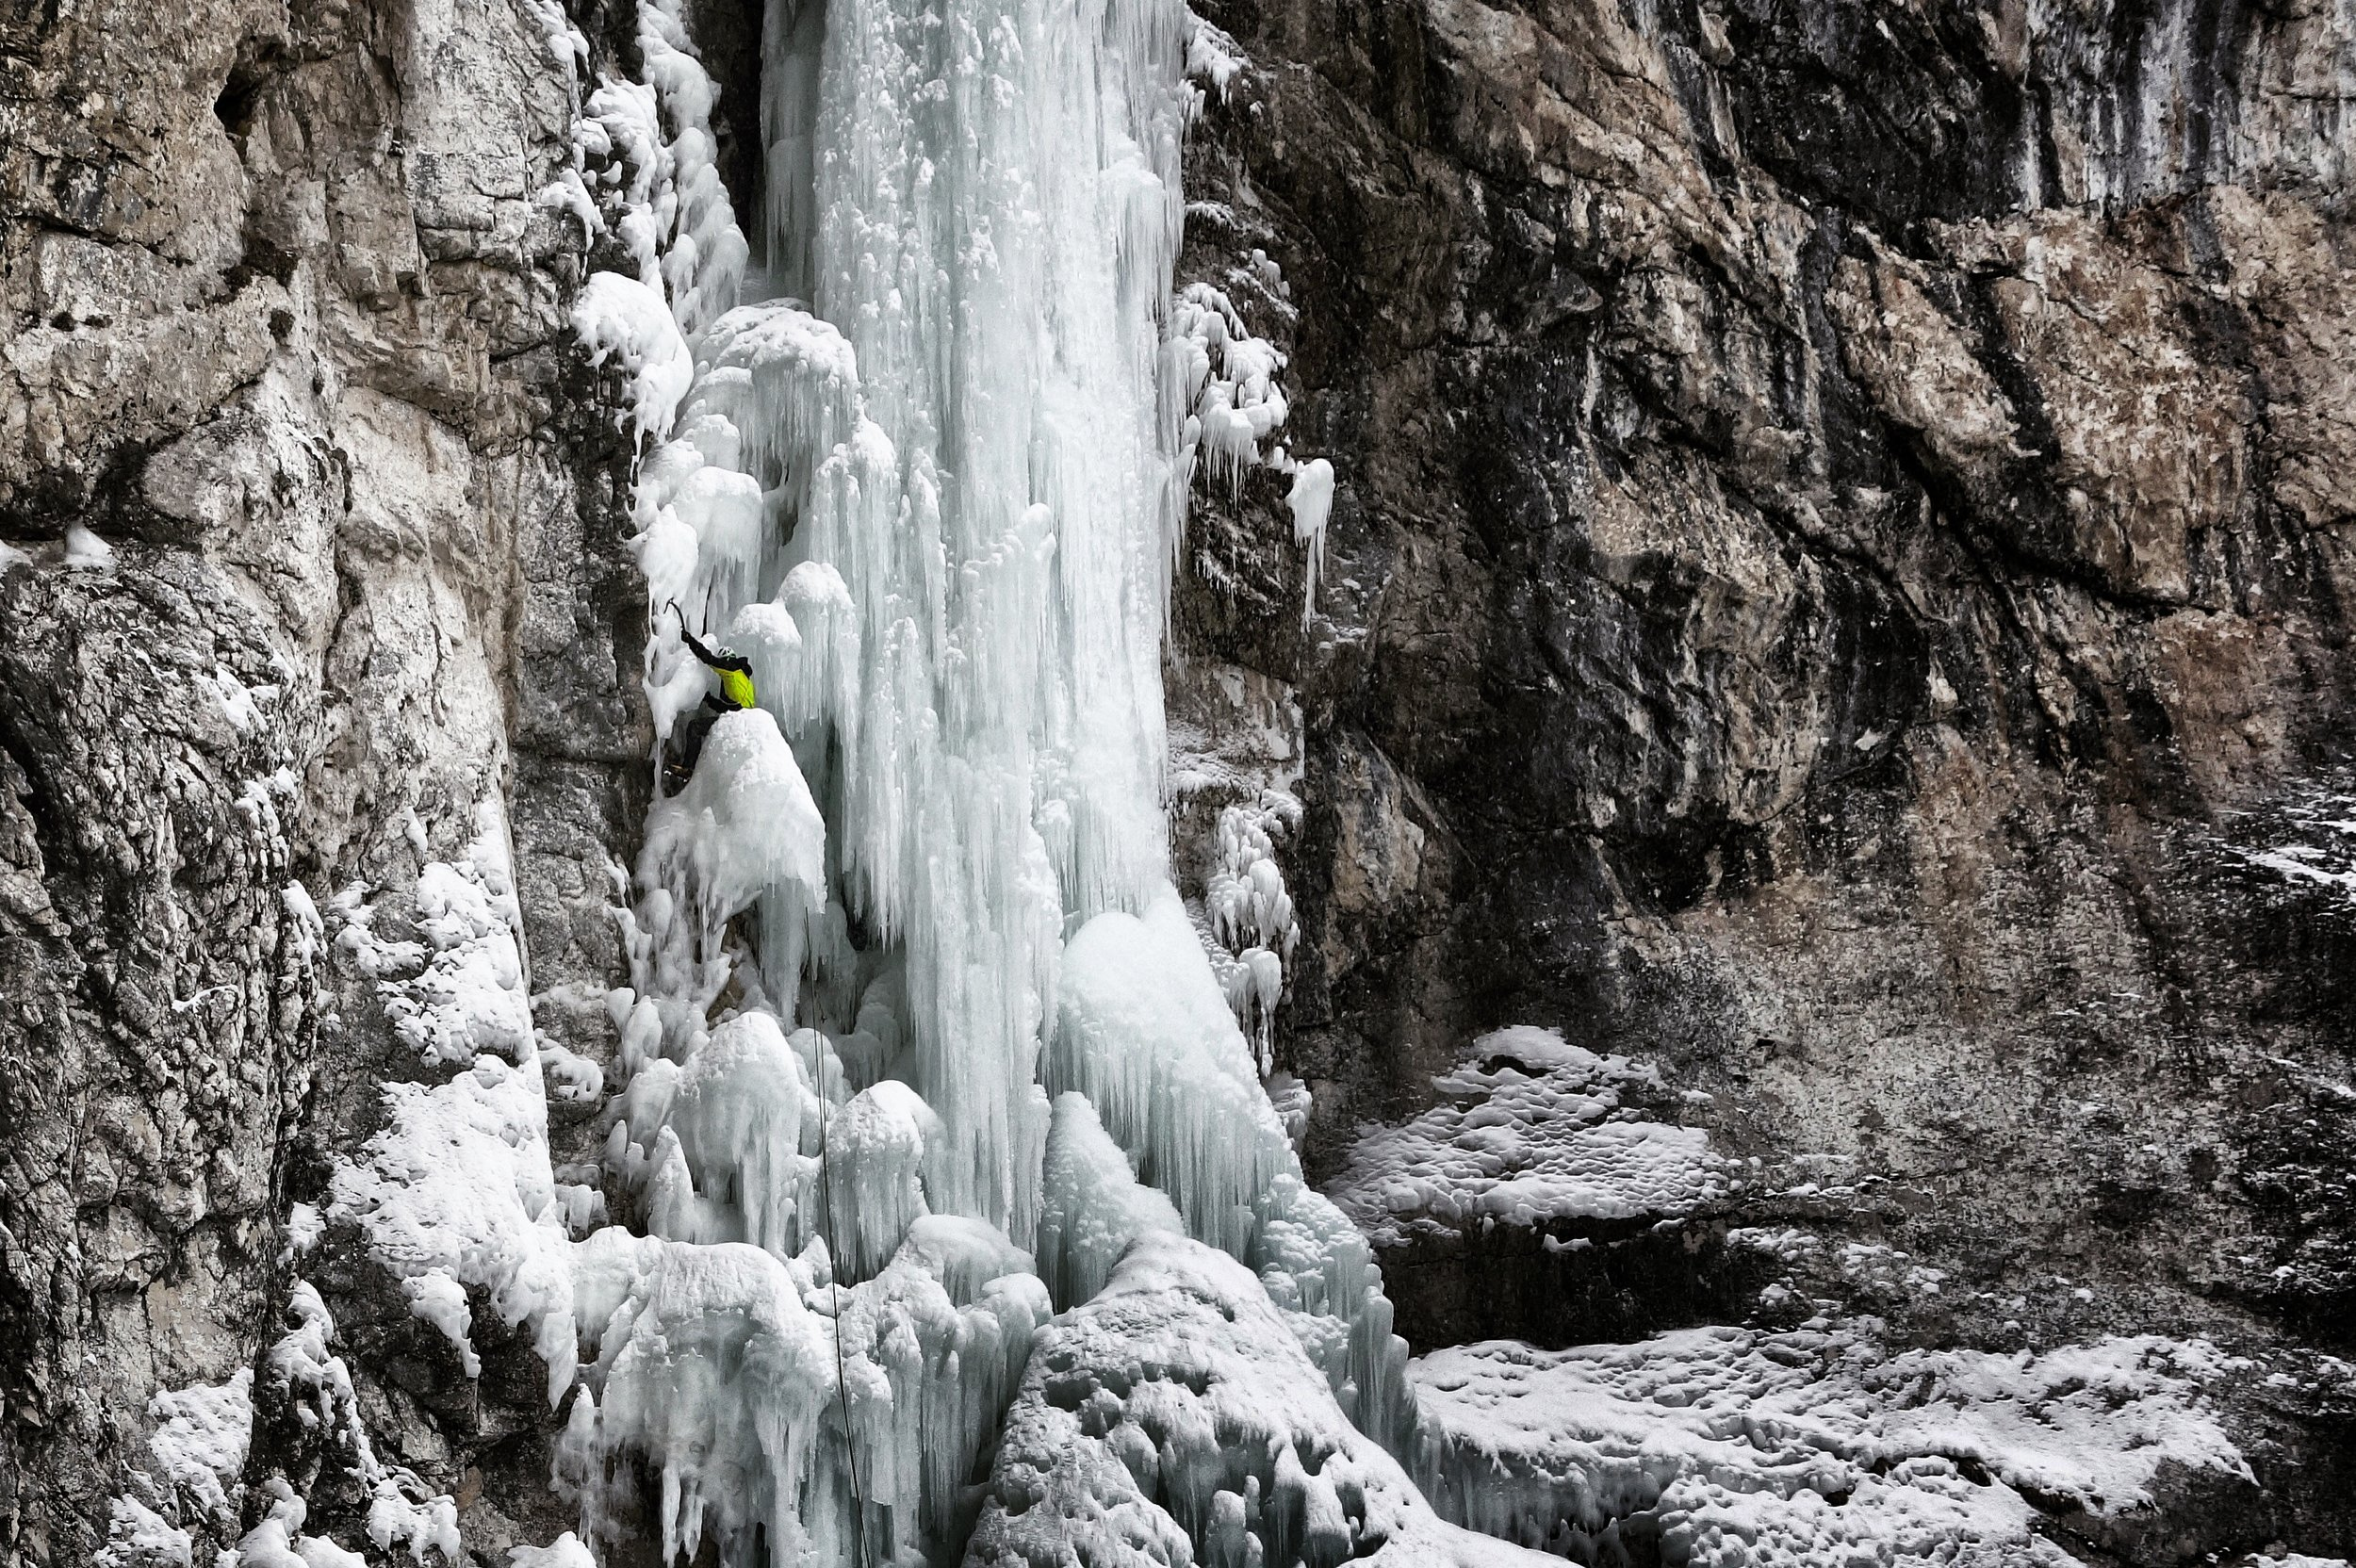 Matthias Scherer on Pilat, Gardena Valley, Italy - picture Tanja Schmitt